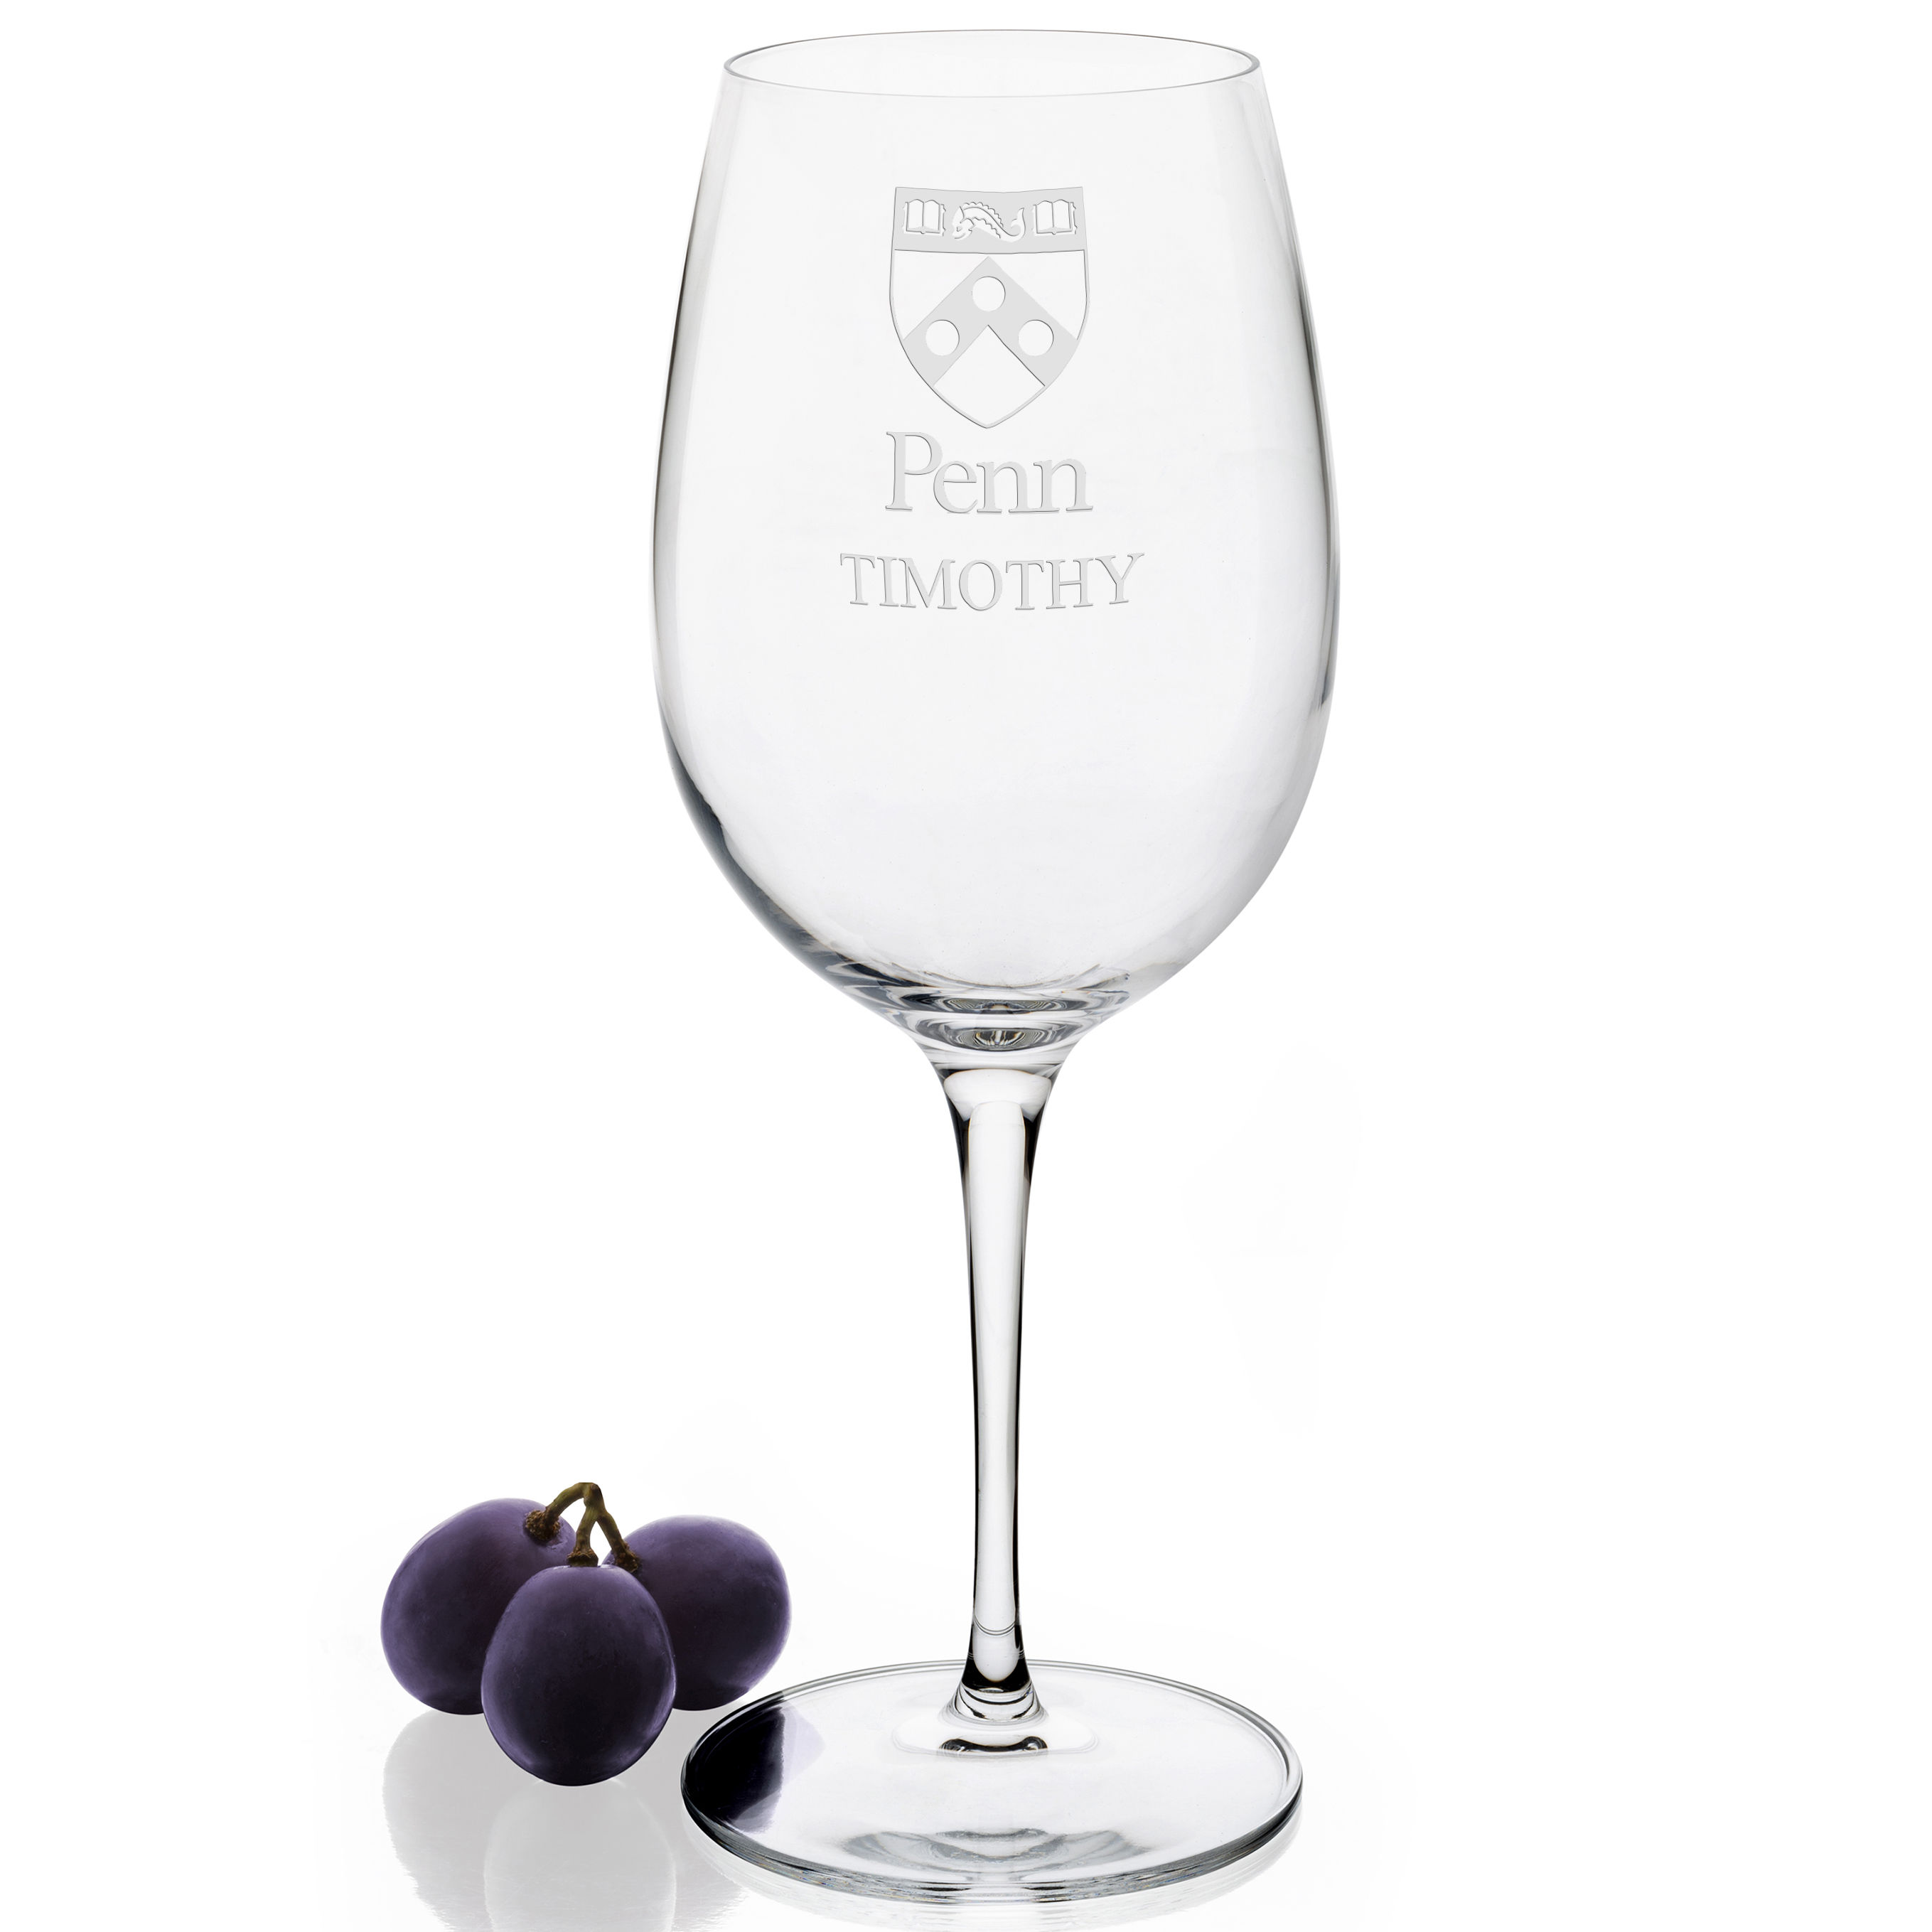 University of Pennsylvania Red Wine Glasses - Set of 2 - Image 2